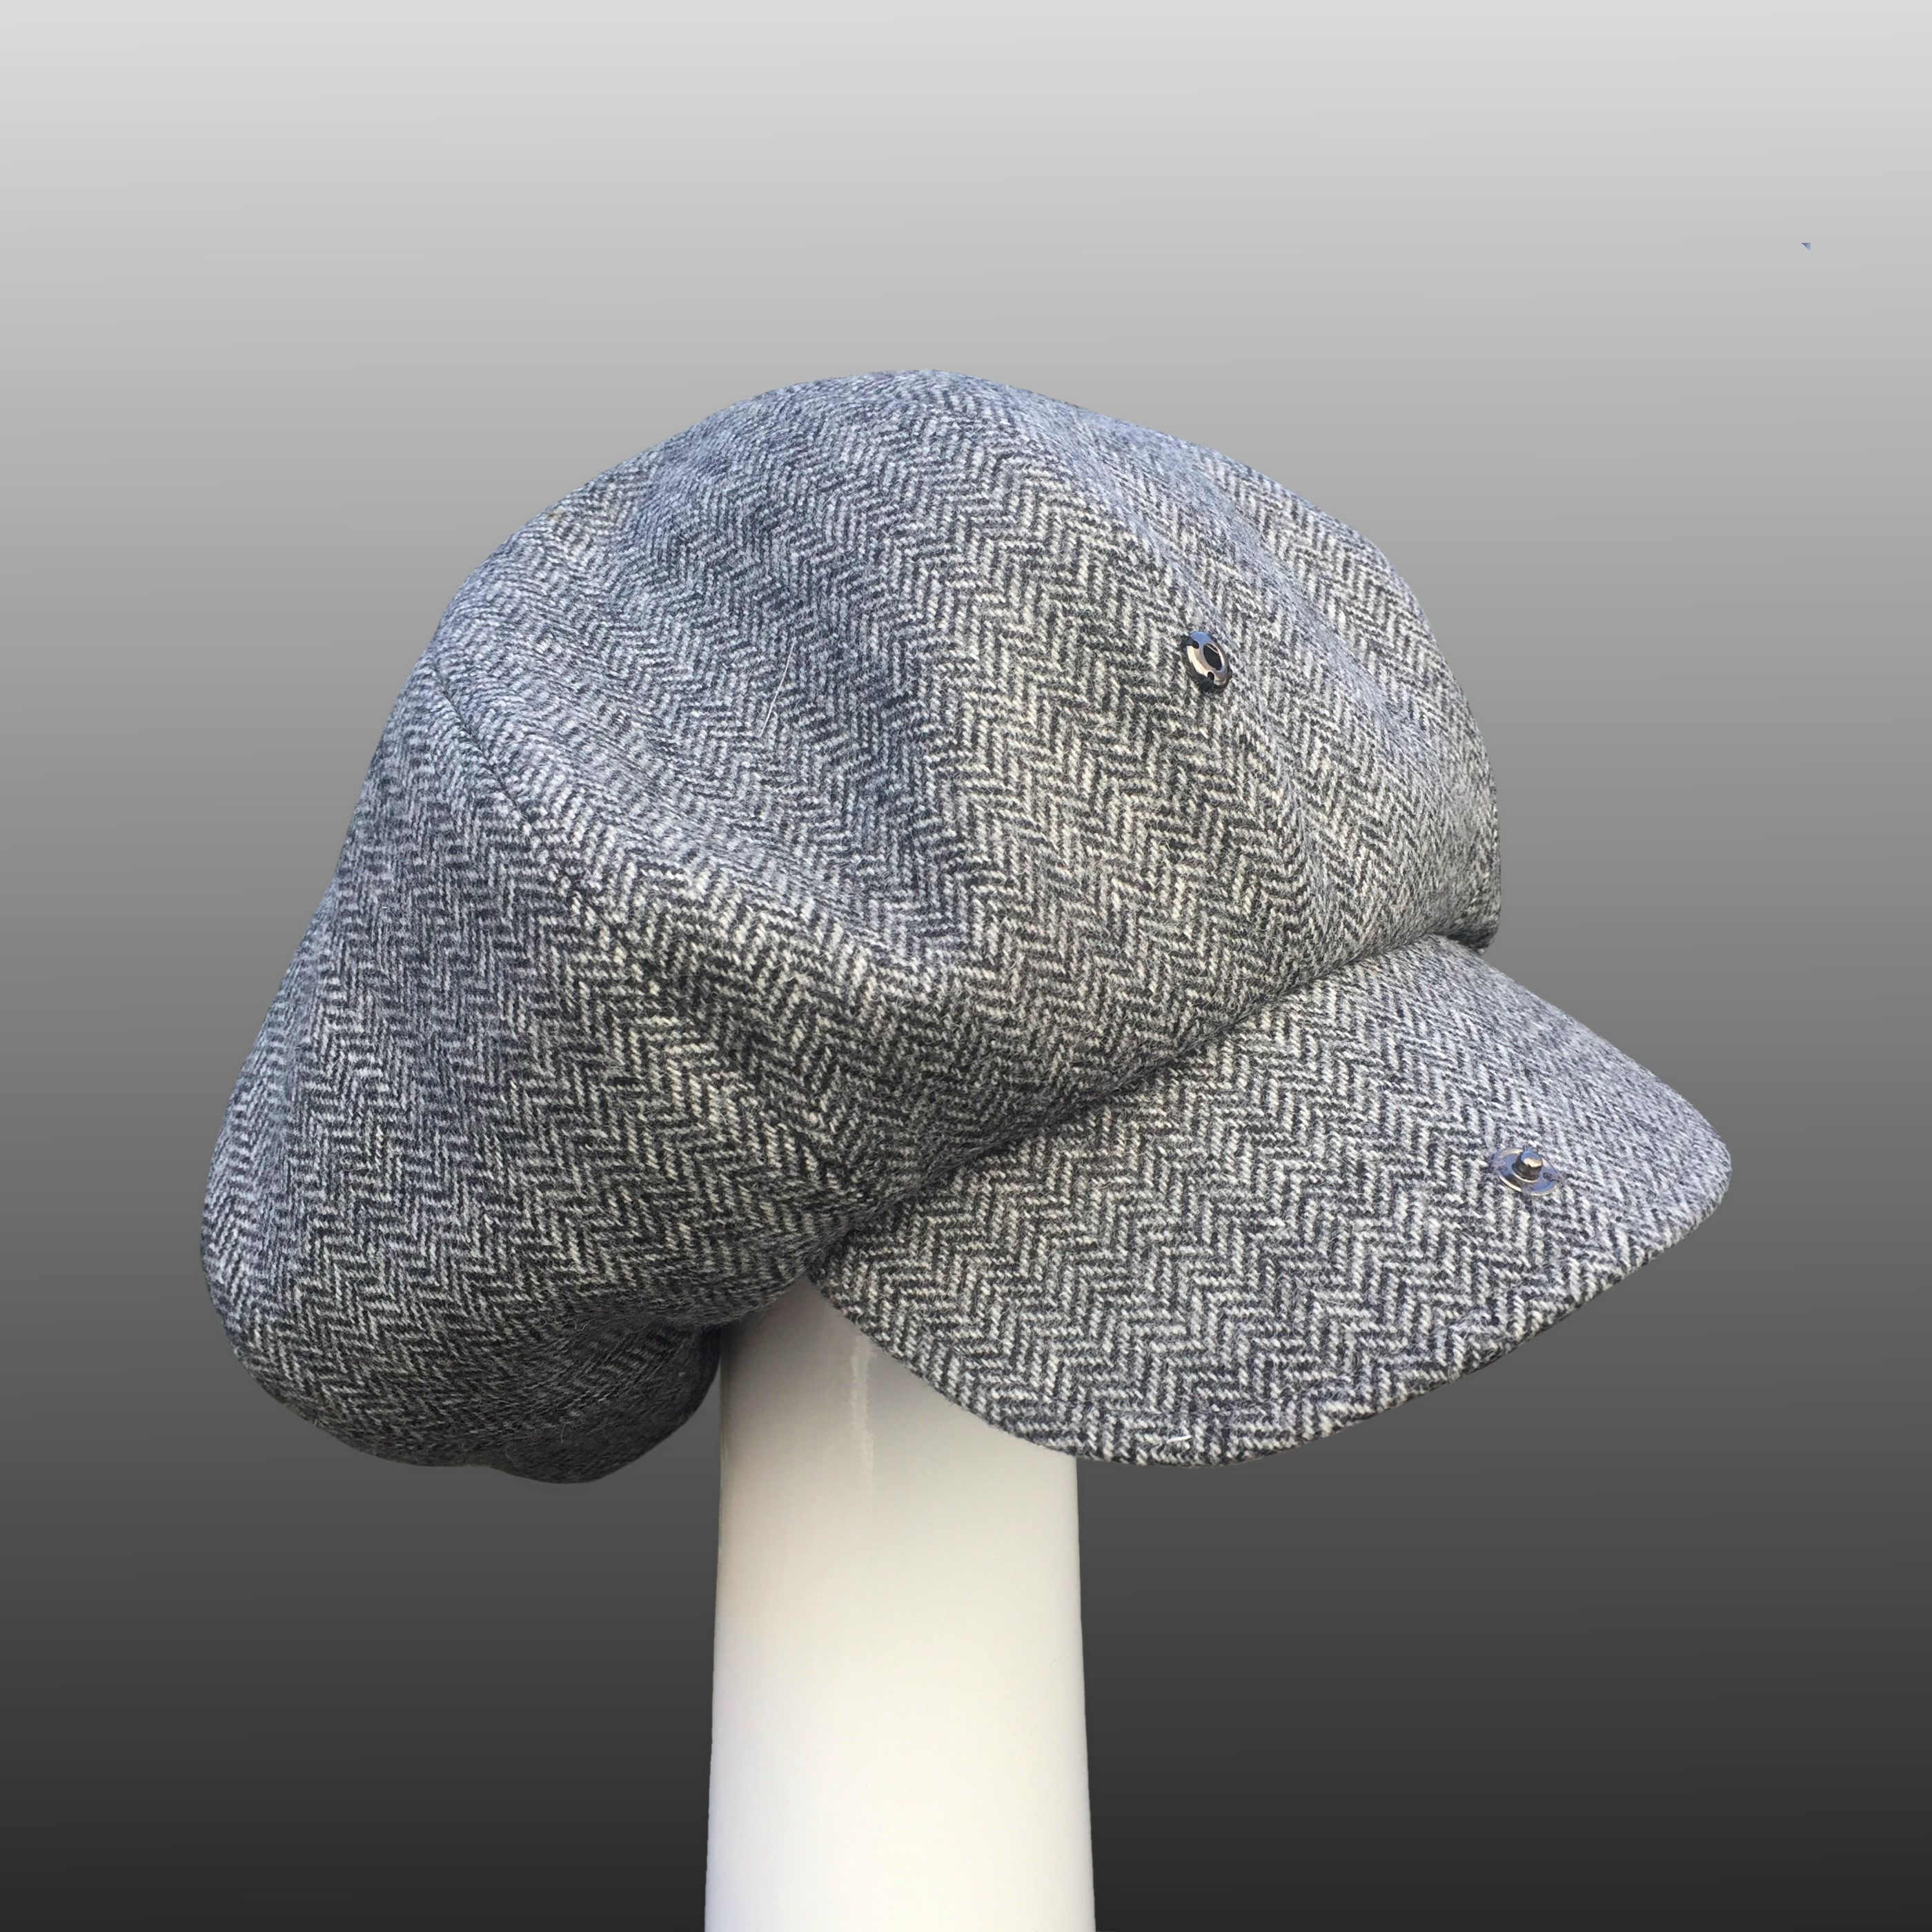 Wool Women Men Top Hat for Gentleman Lady Steampunk Fedora Hat with Floral Satin Ribbon Black